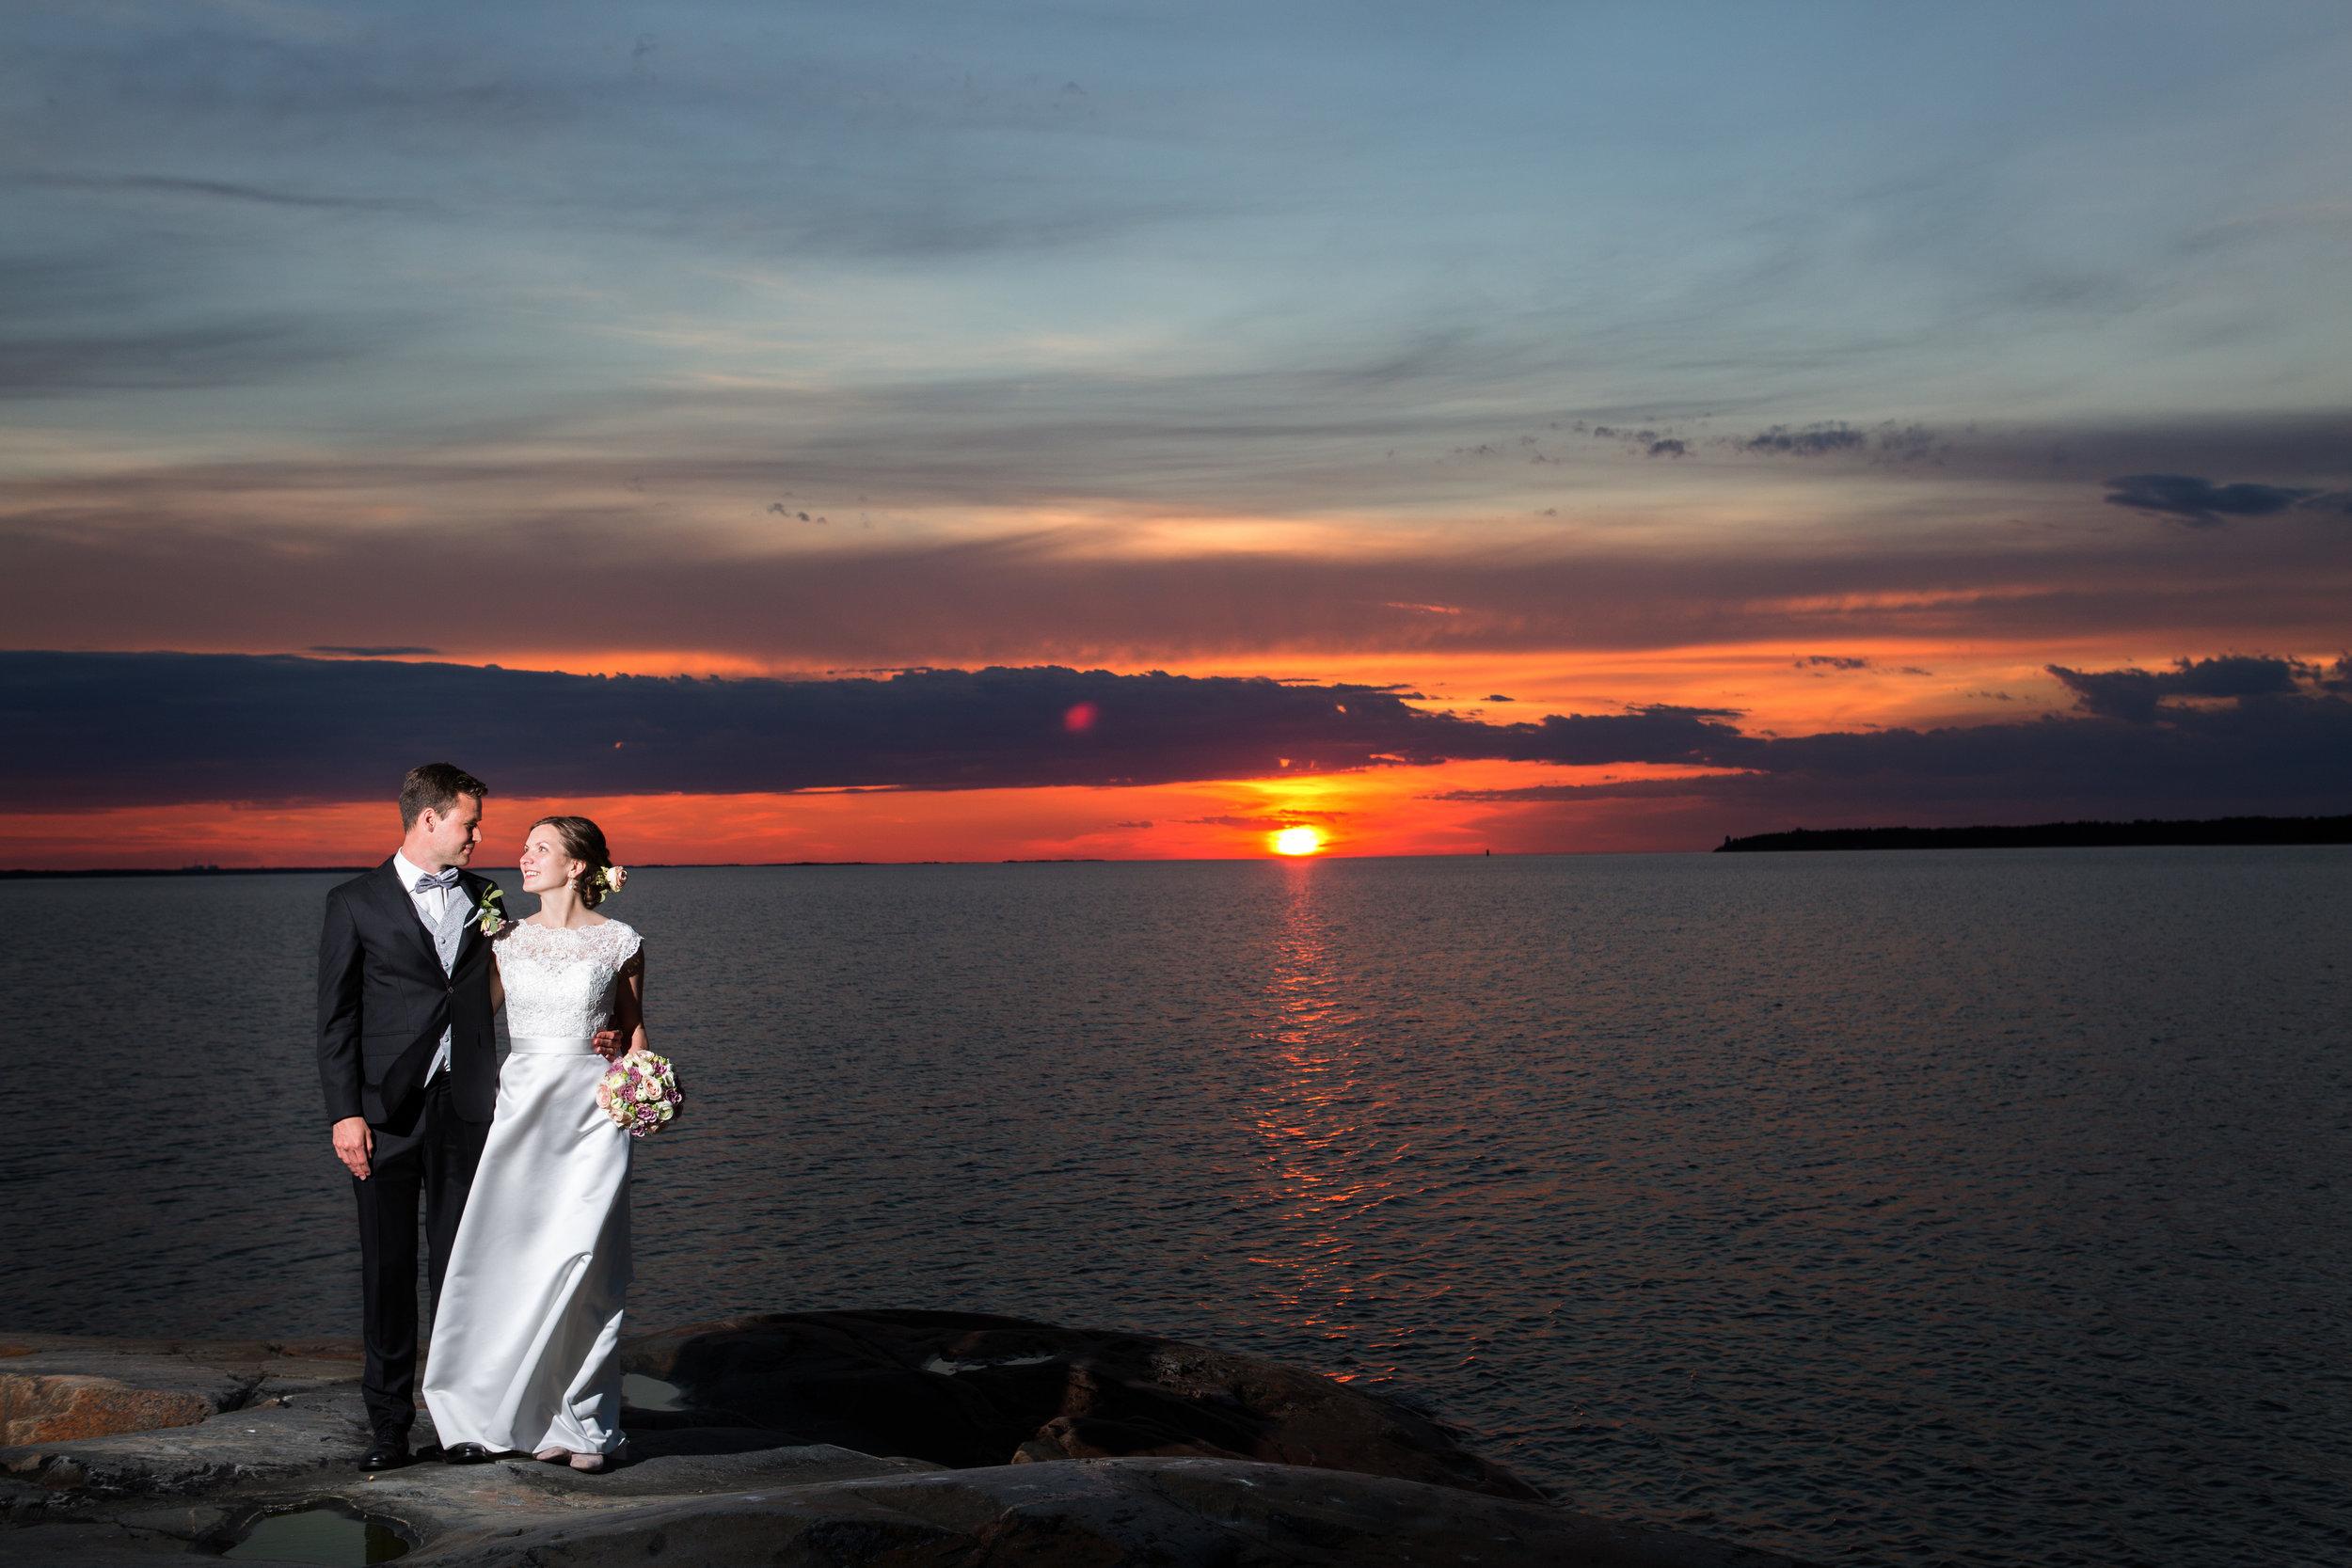 San Diego Wedding and Destination Wedding Photography Blessed Weddings 86.jpg